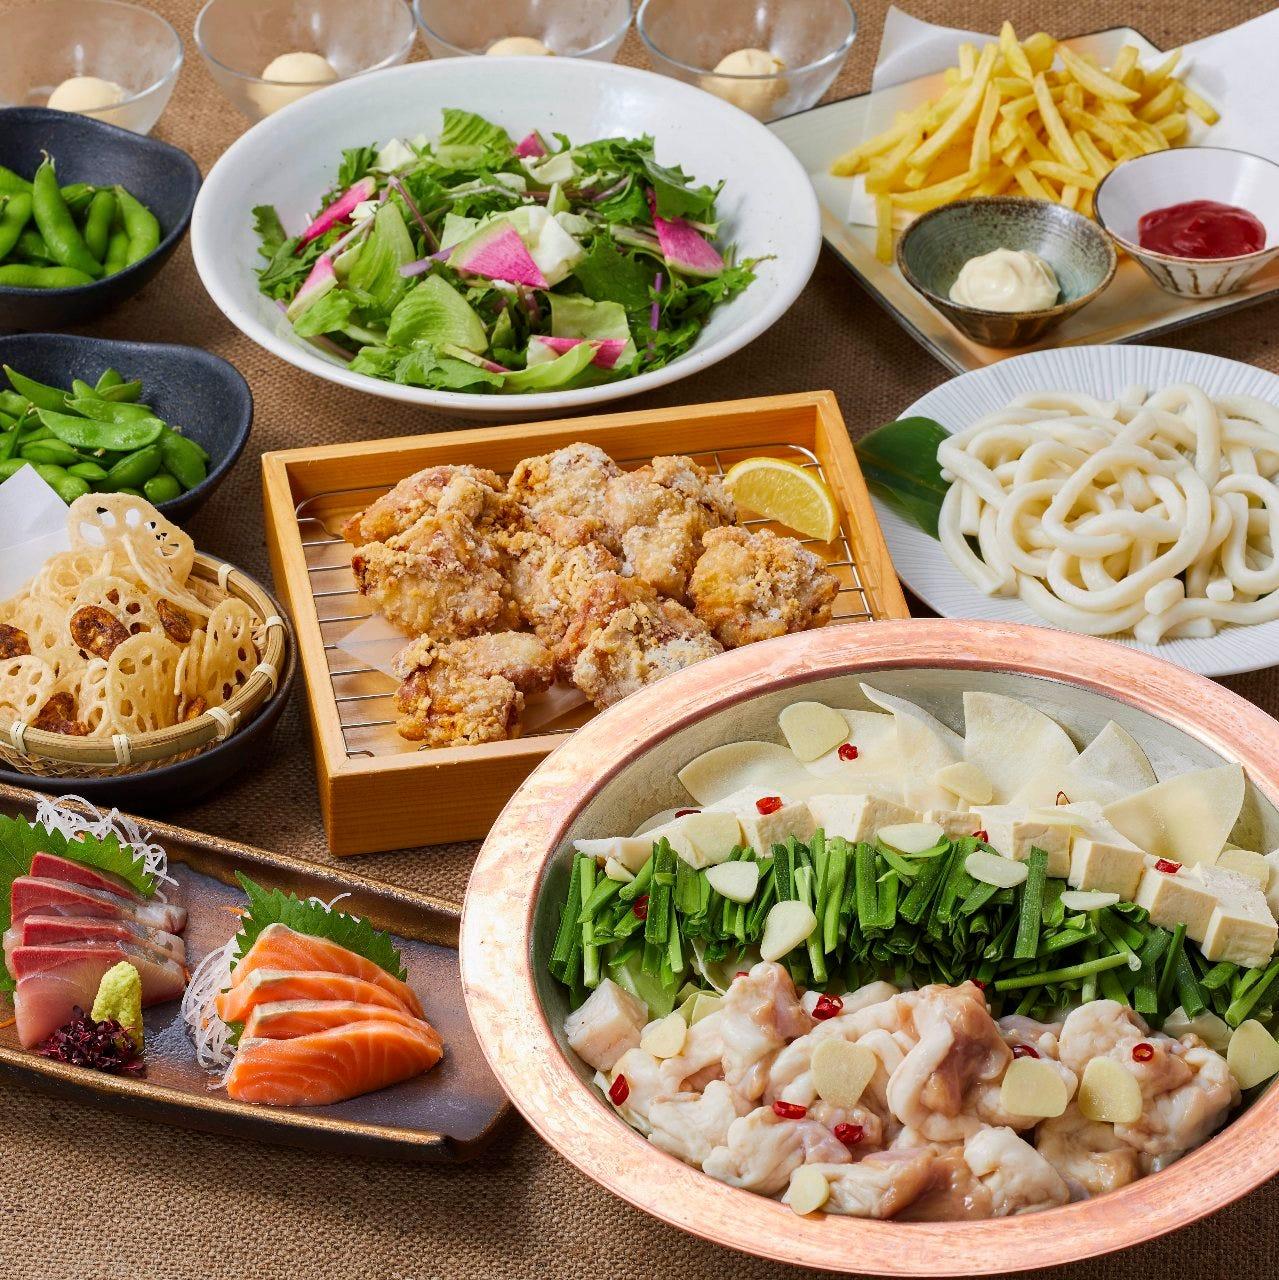 【2H飲放題付】全9品 刺身盛り合わせと選べる鍋コース 3500円(税込)